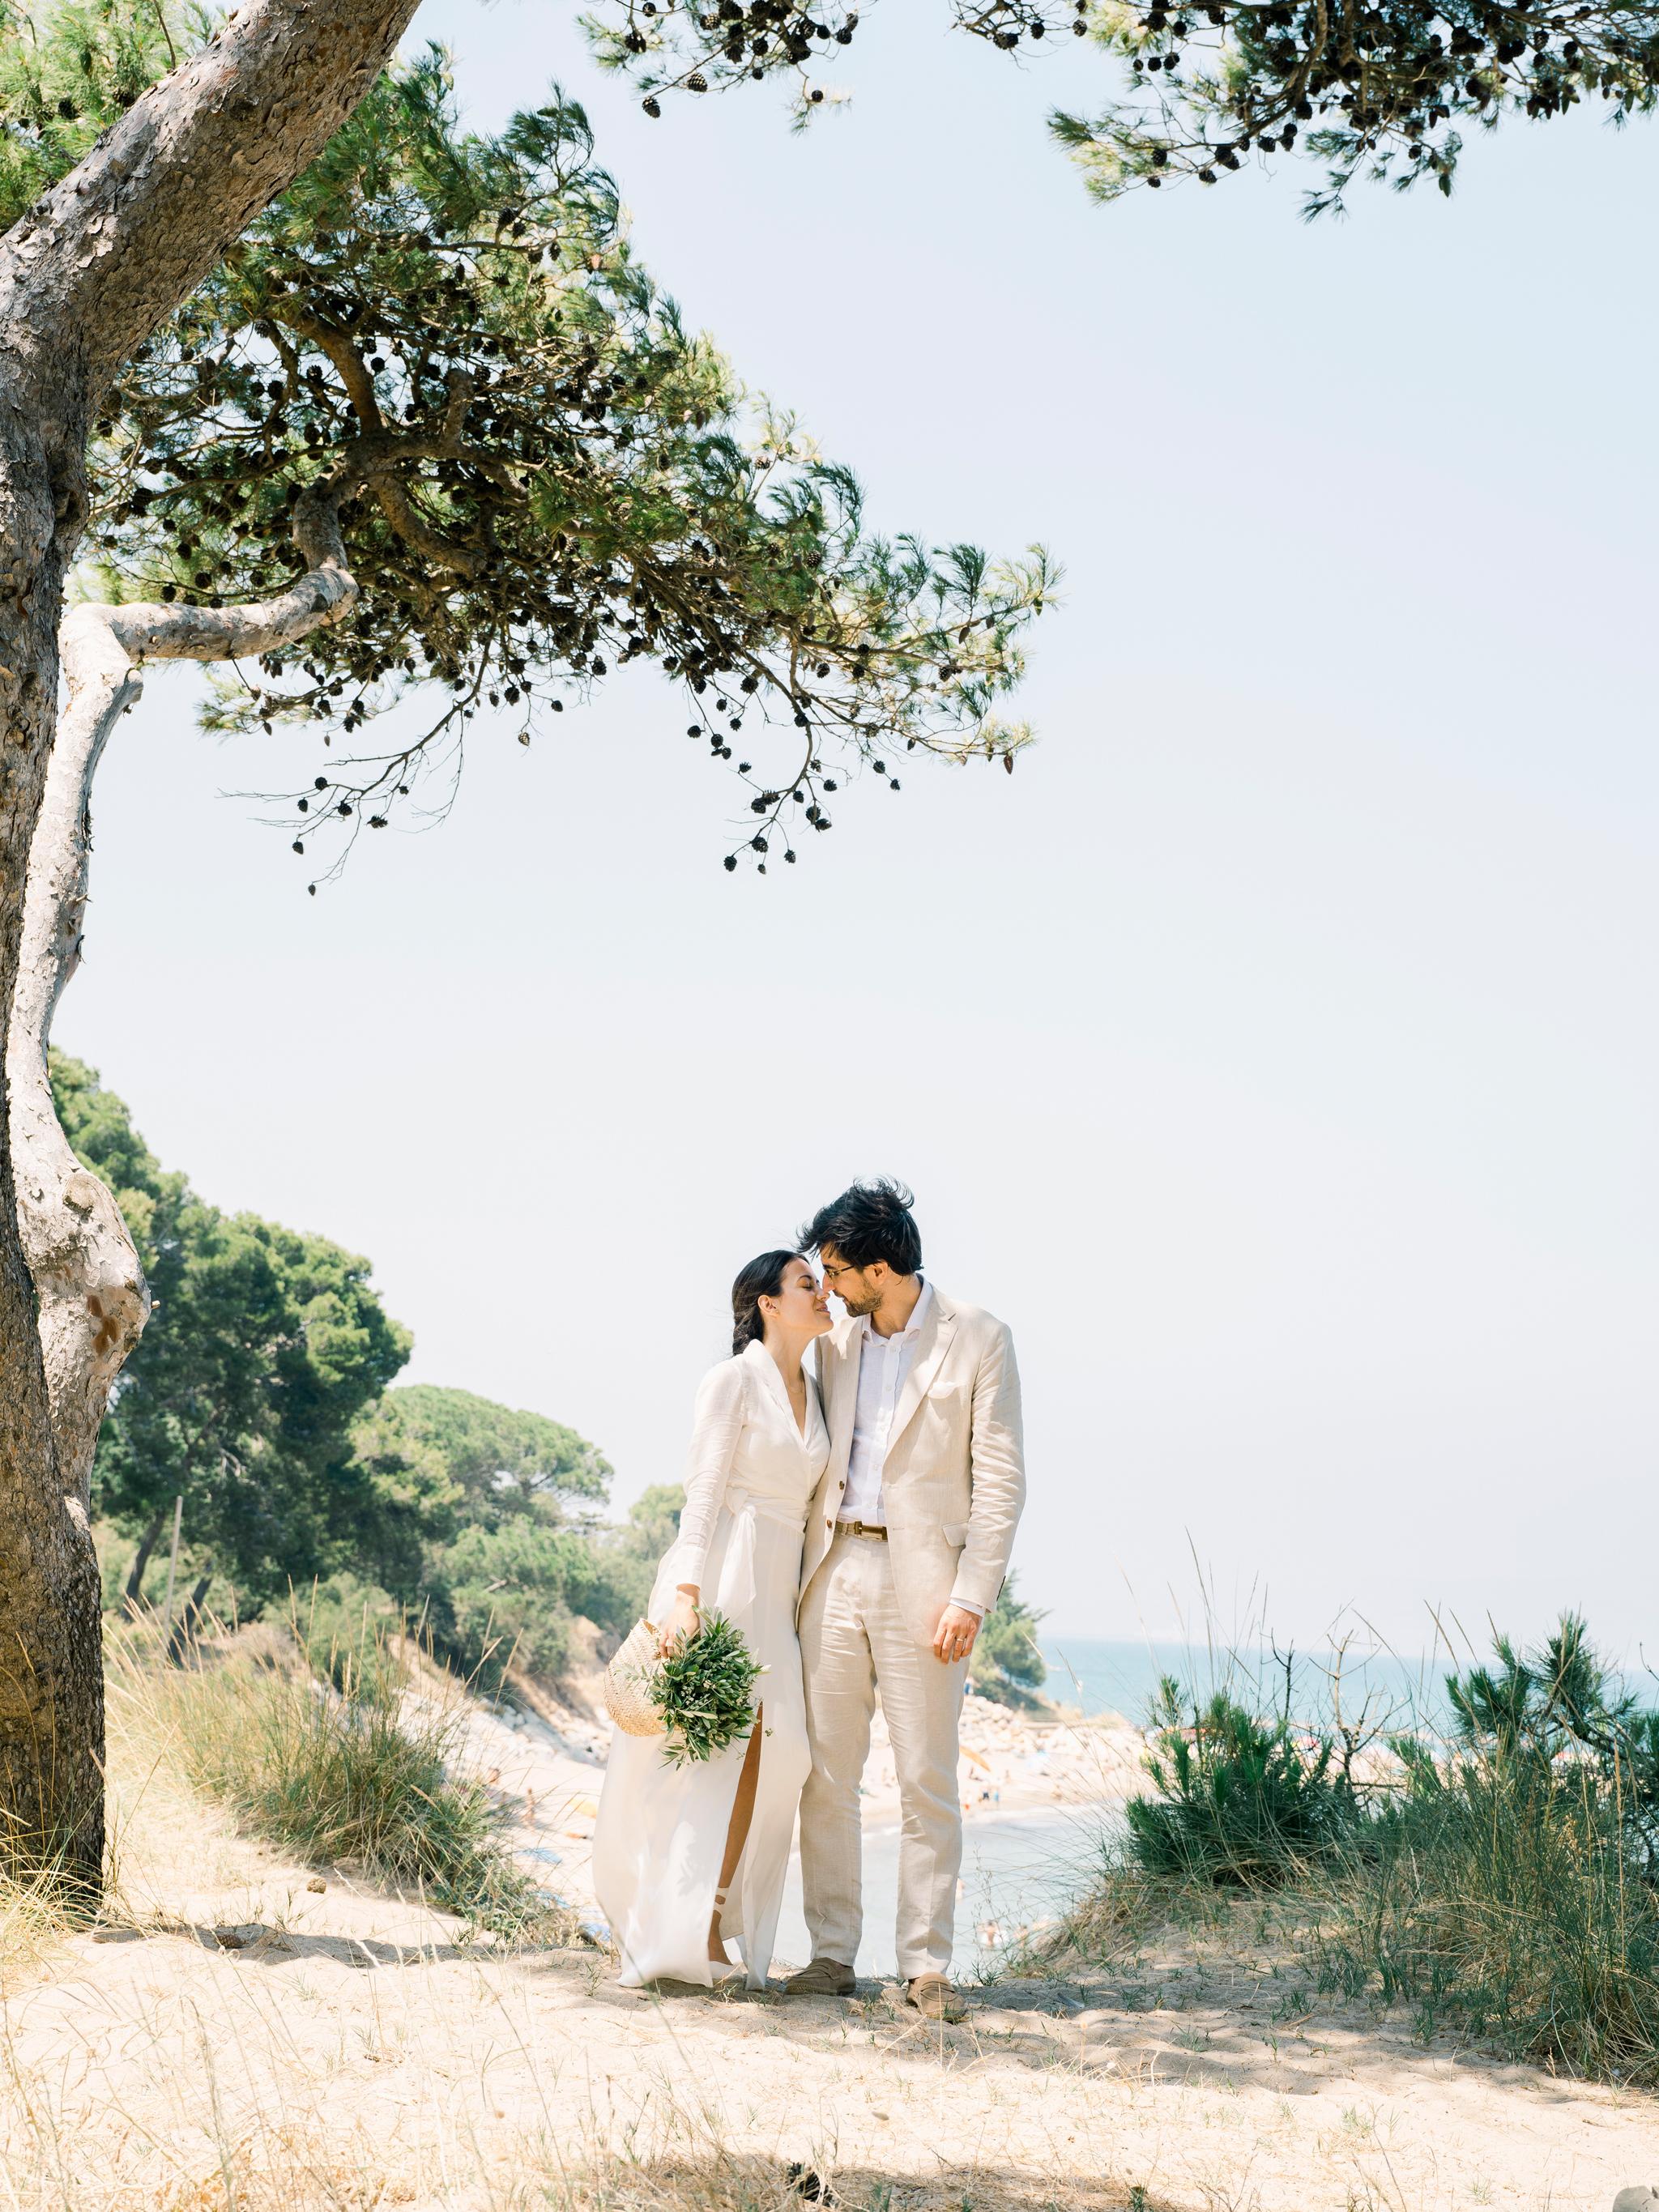 fotografia-boda-mediterraneo050.jpg